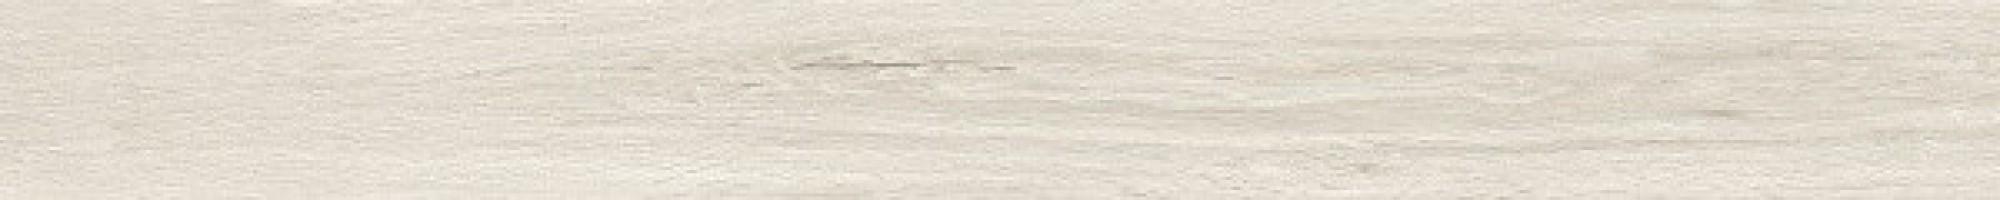 Керамогранит Ragno Woodclassic Blanco 10/13x100 R5RV